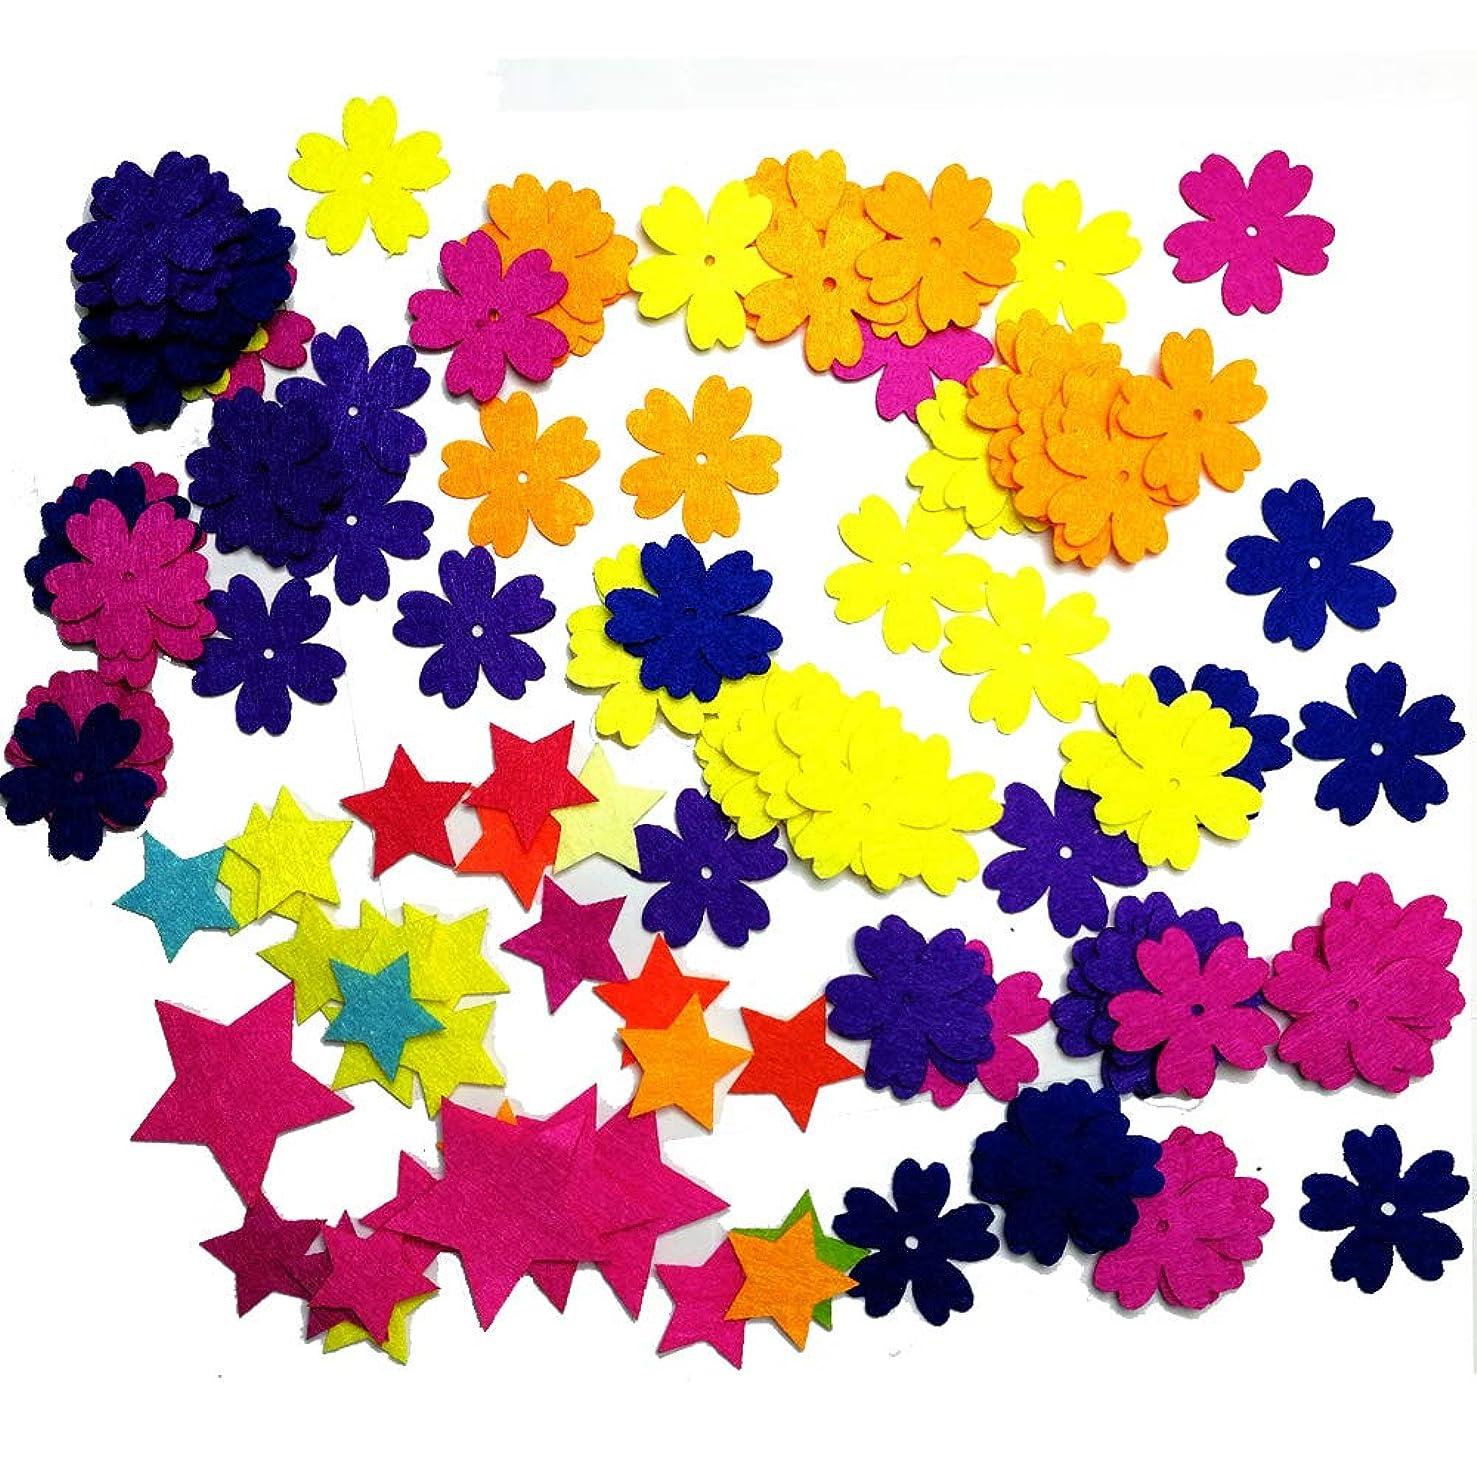 Felt Flowers Fabric Flower Embellishments for DIY Crafts Sewing Handcraft, Assorted Color 150 PCS